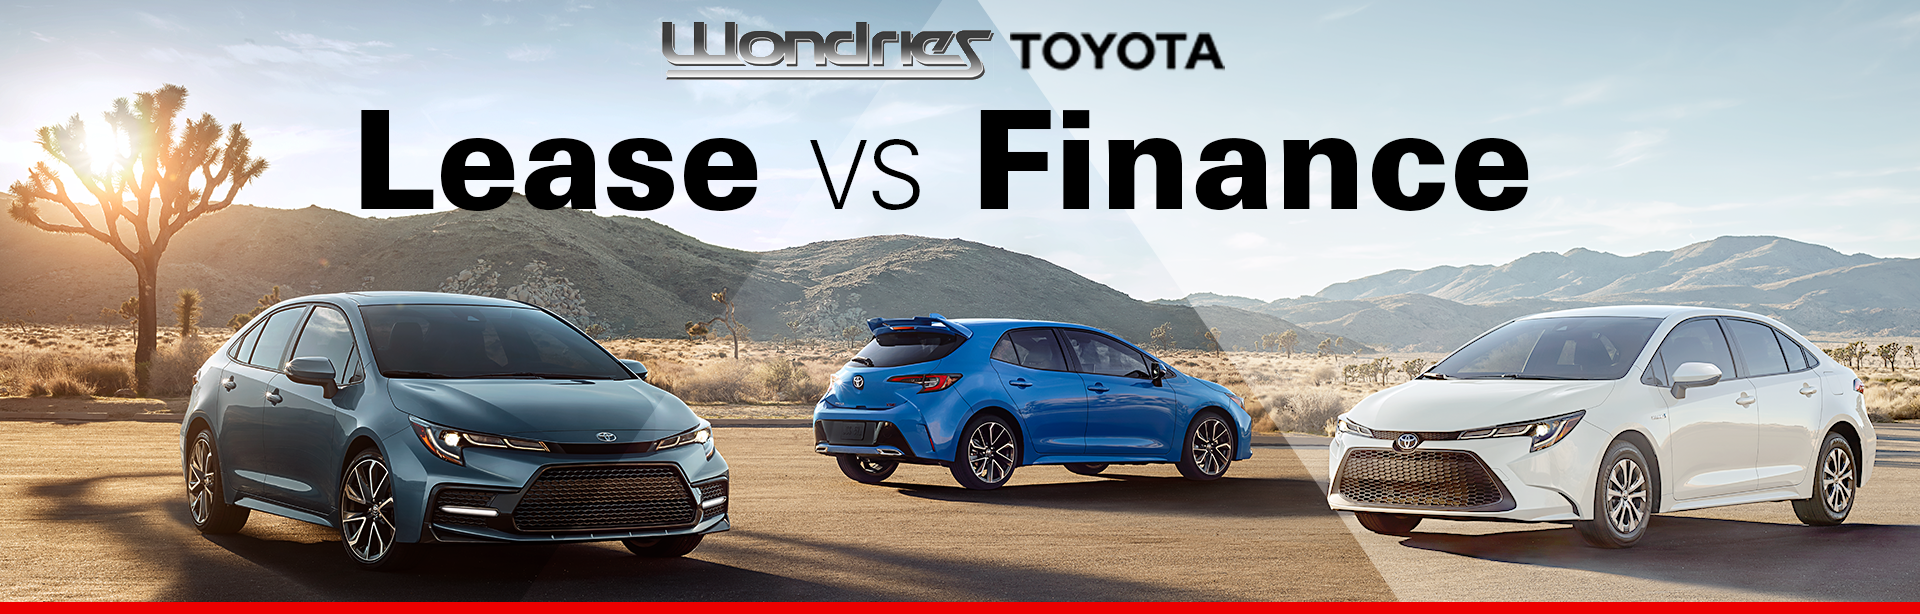 Lease Vs Finance at Wondries Toyota